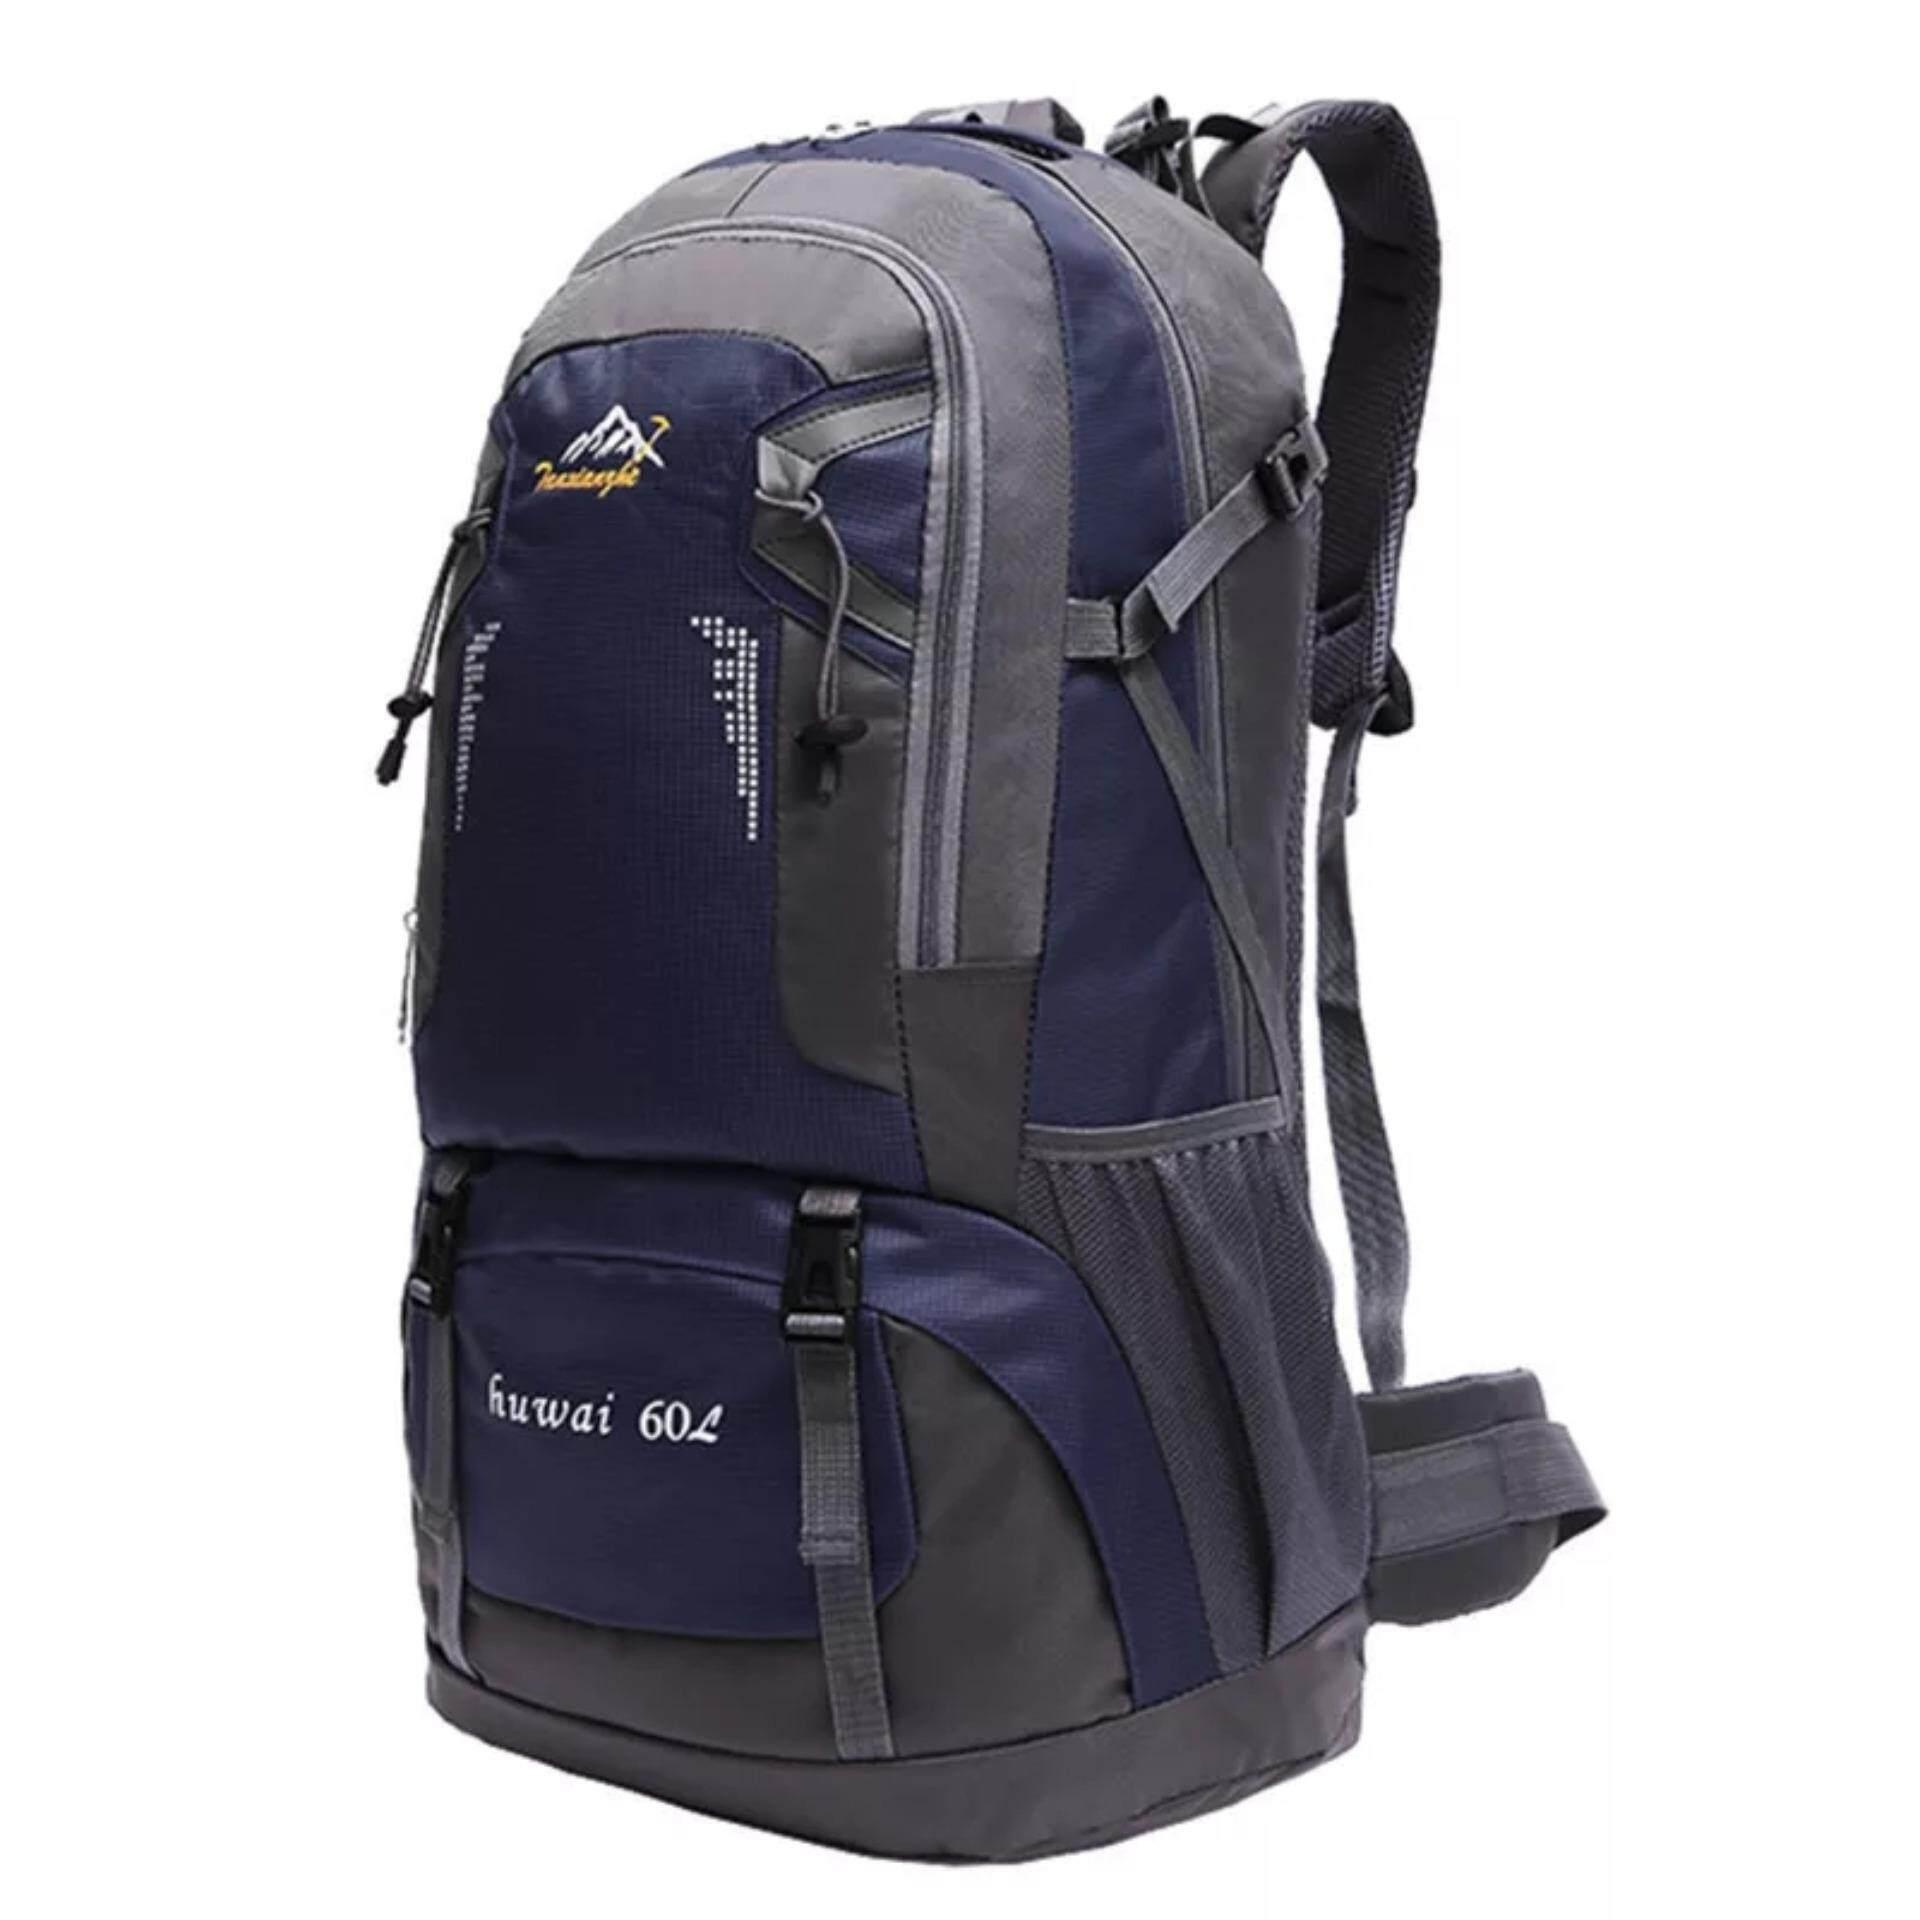 Vivo Store 60L Waterproof Travel Sport Backpack Outdoor Camping Hiking Sport Bag Daypack - Dark Blue